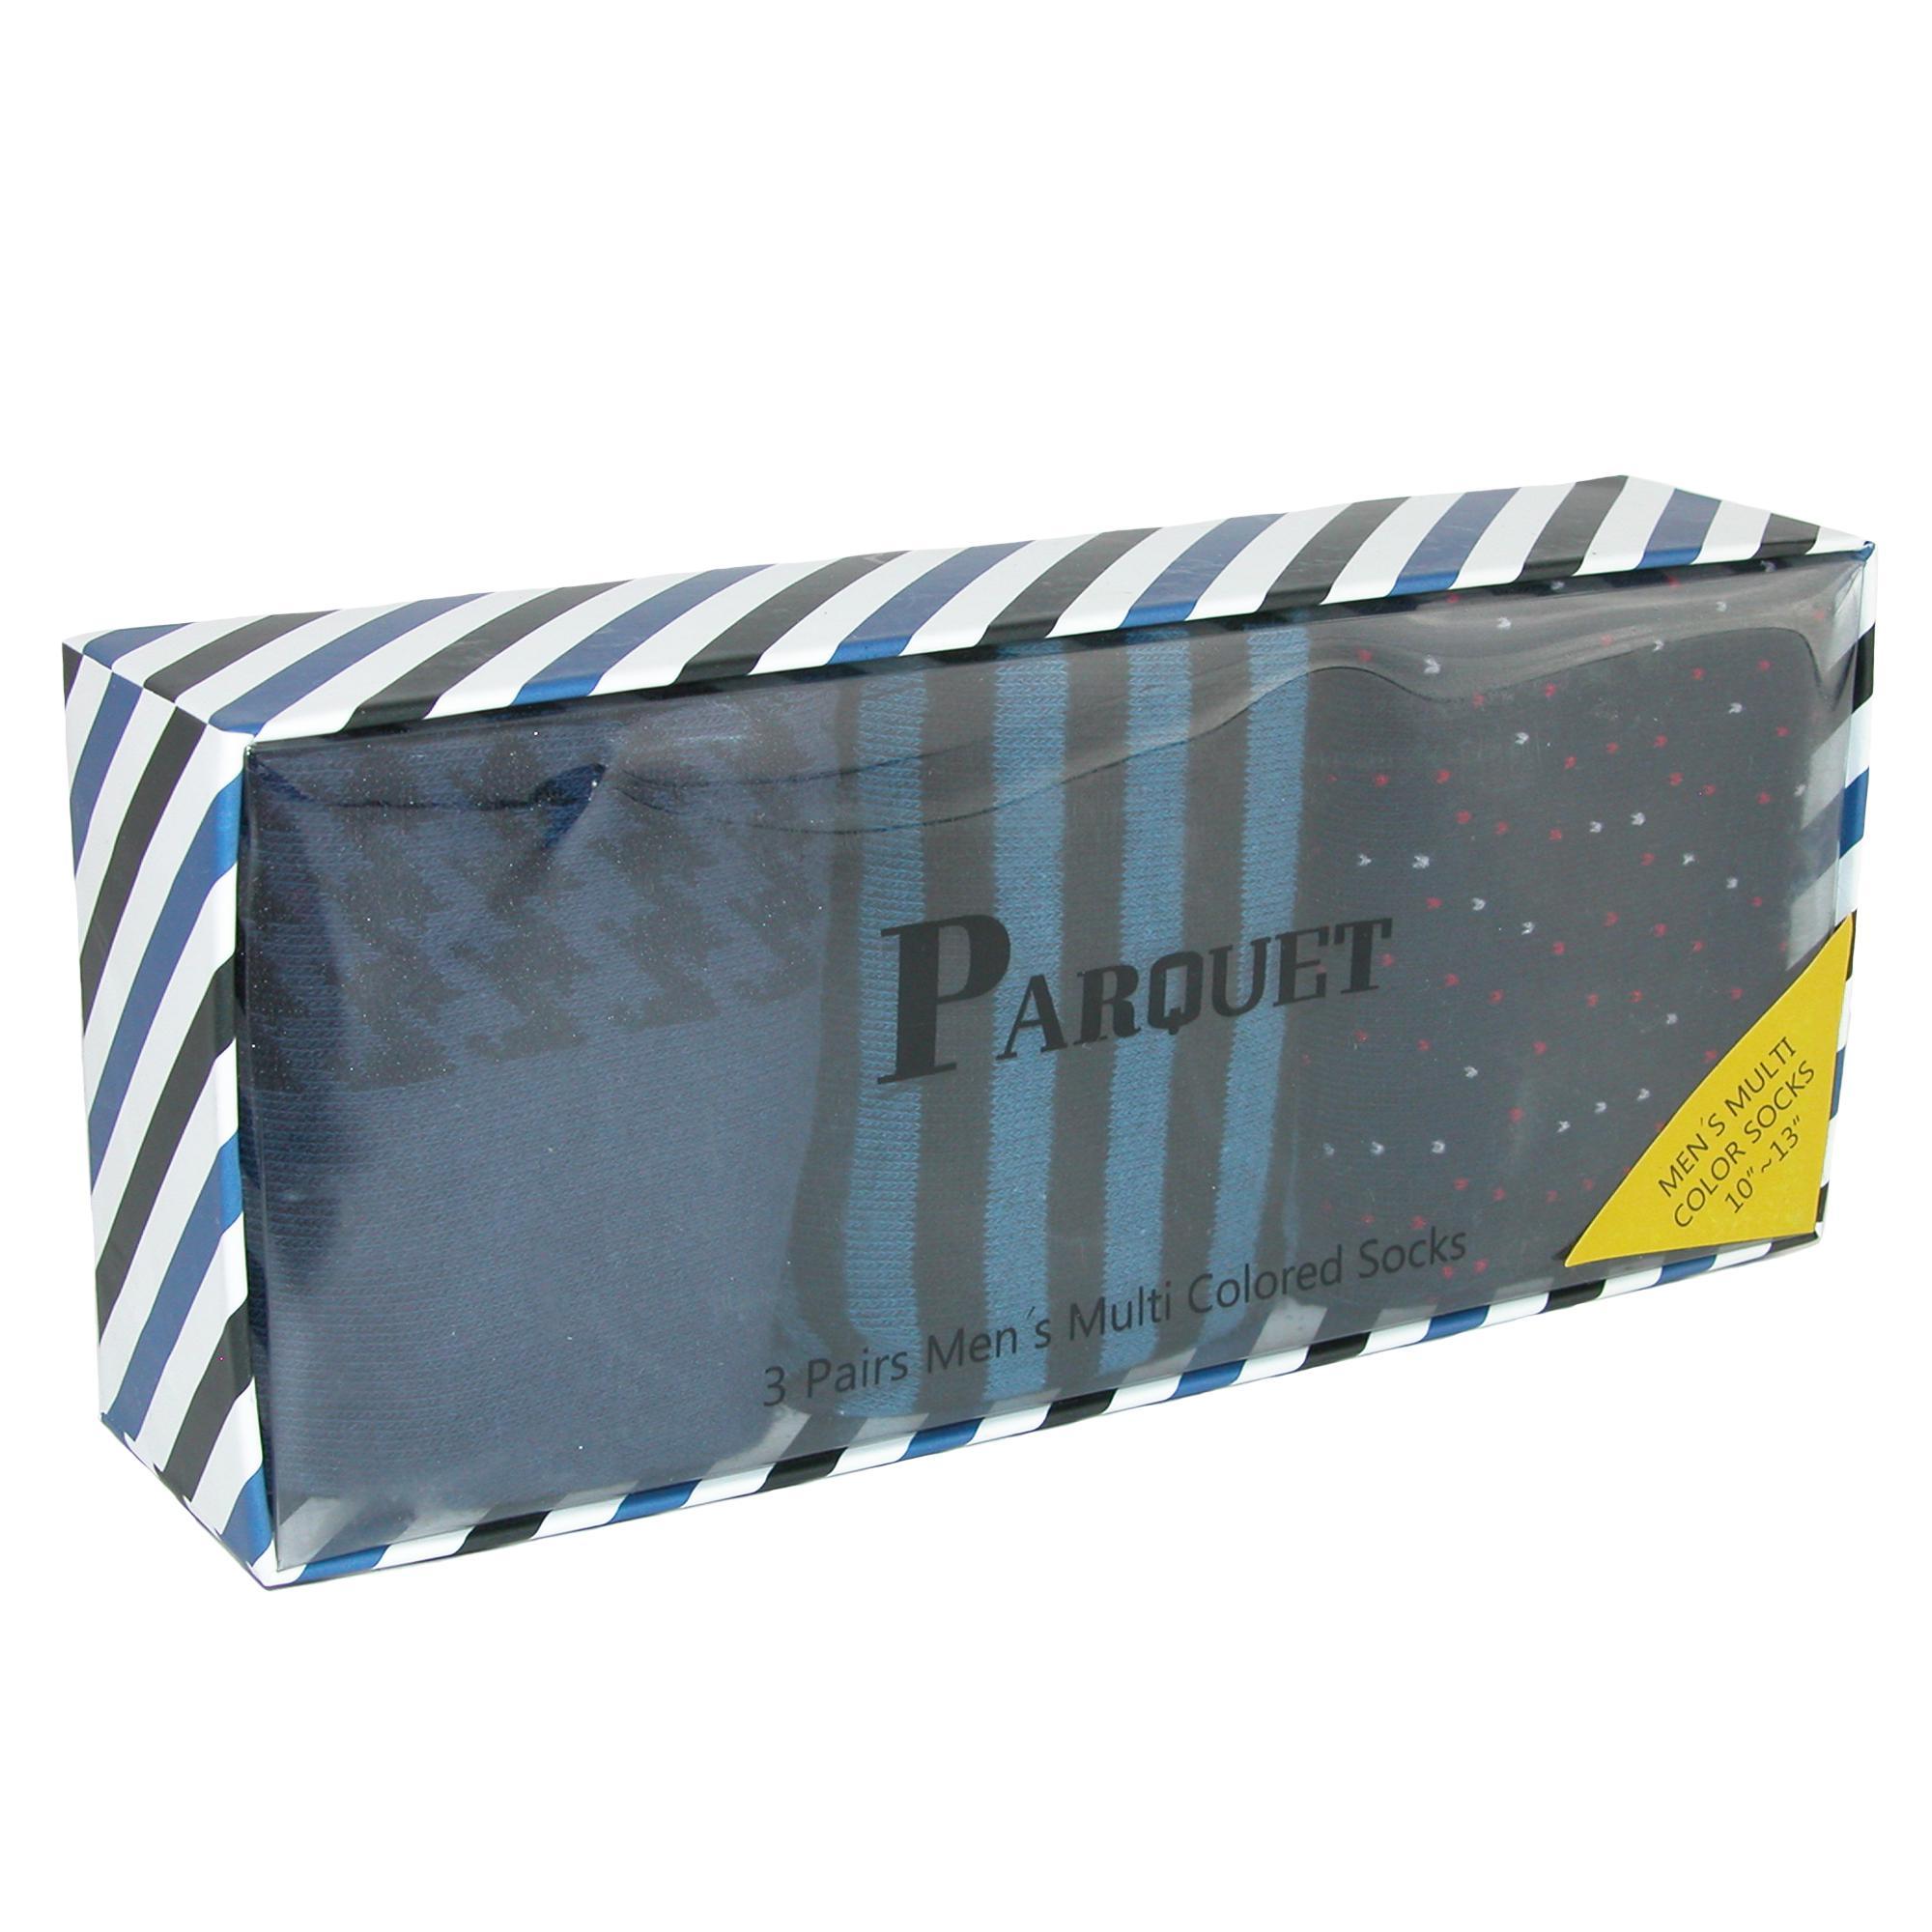 New-Parquet-Men-039-s-Dress-Sock-Gift-